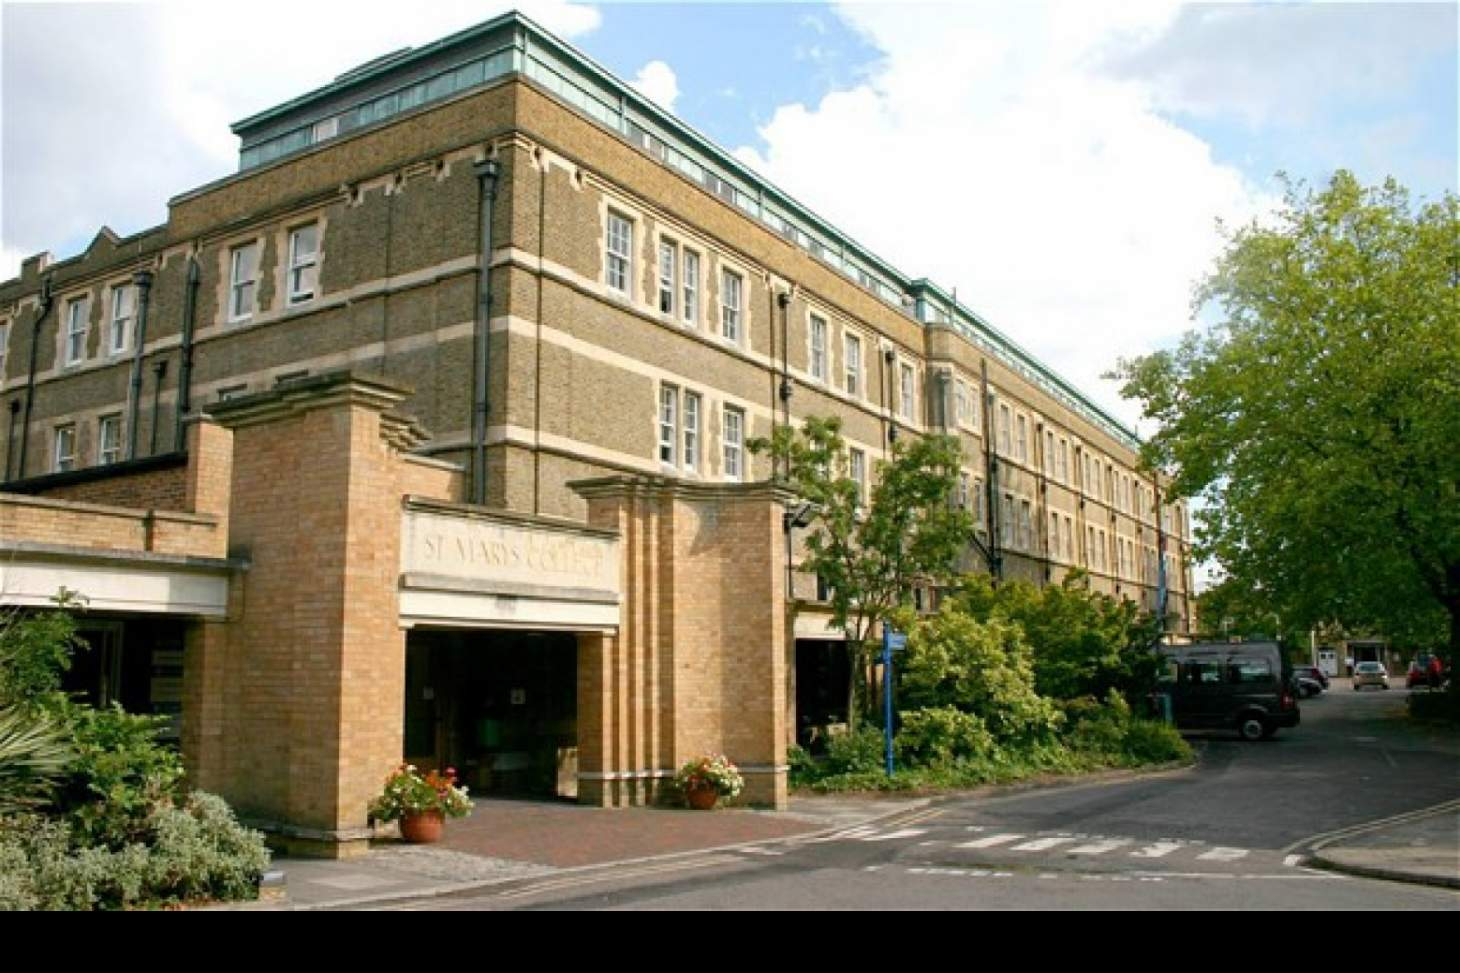 St Mary's University (Teddington Lock) 5 a side | Astroturf football pitch